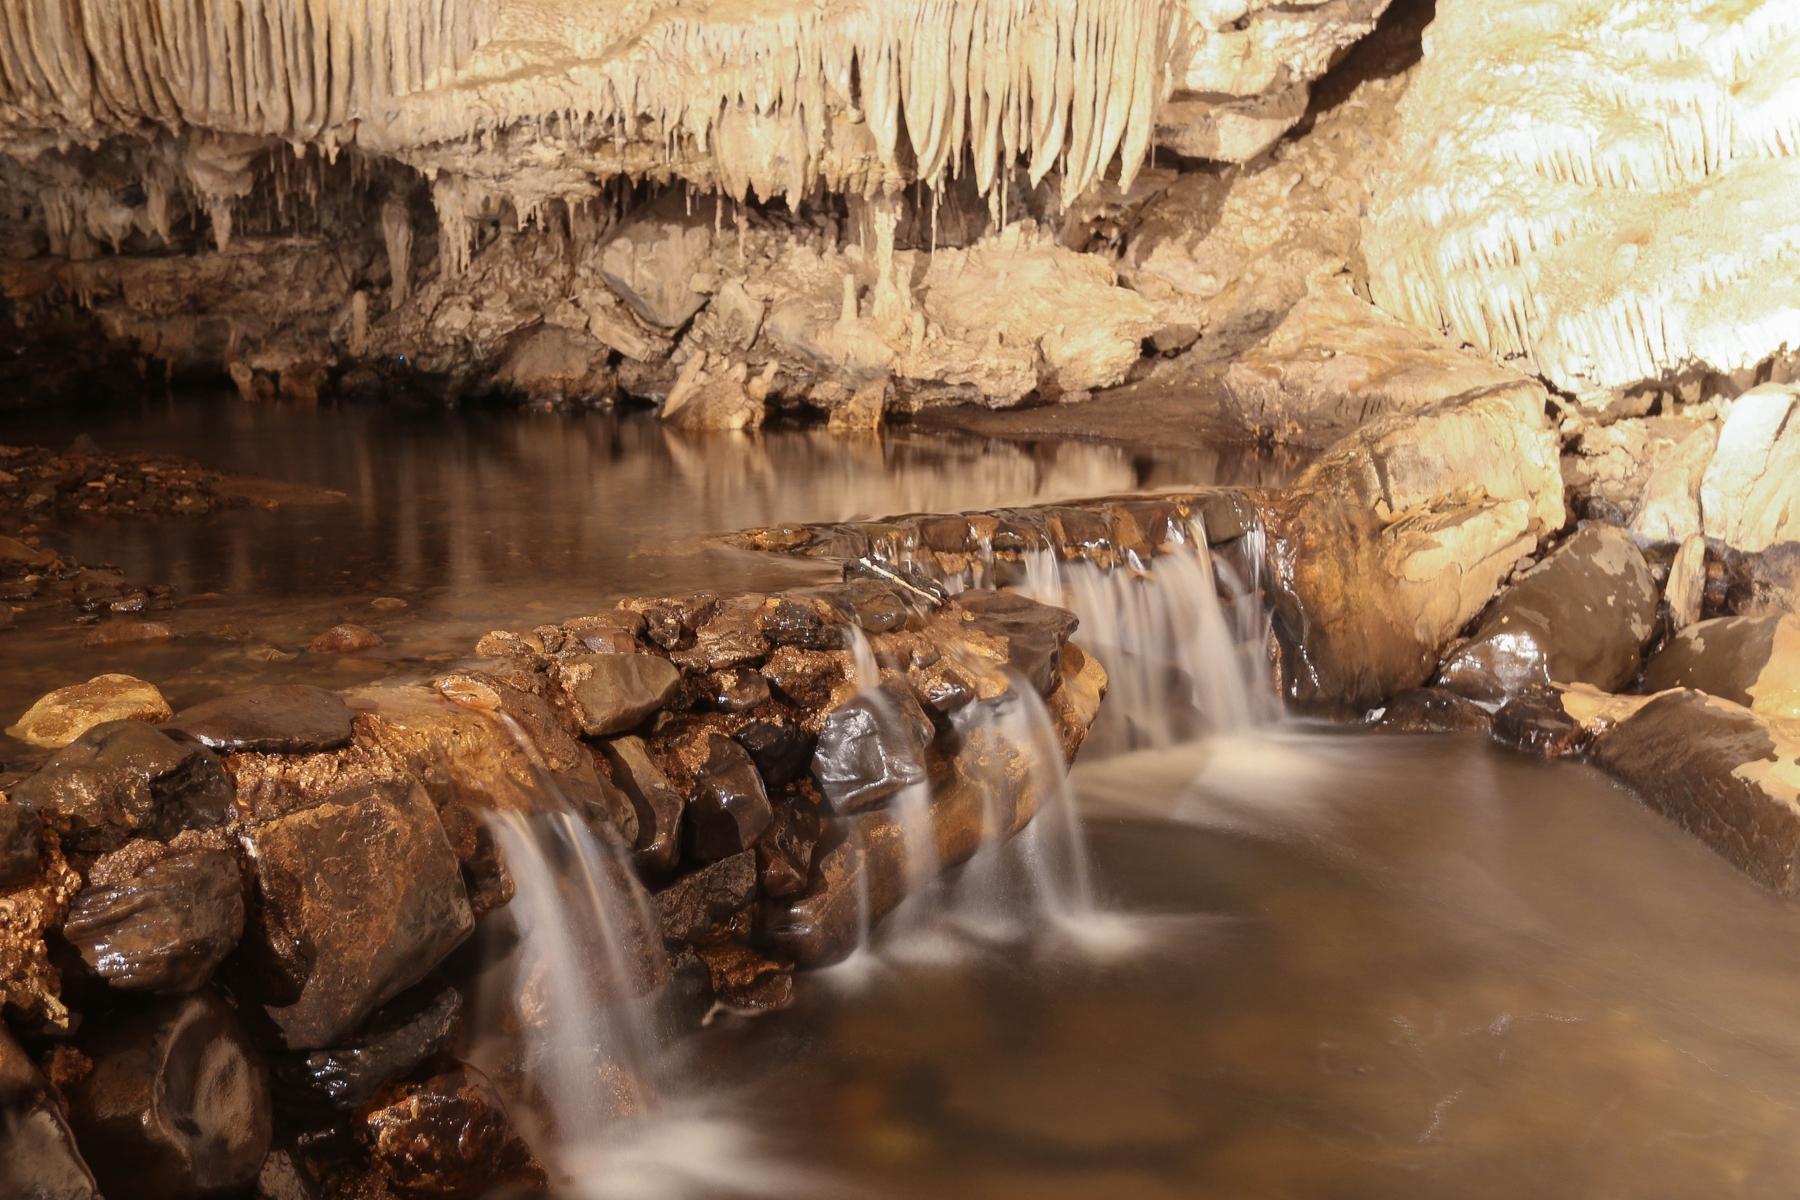 Marakoopa Cave, a limestone cave in Mole Creek Karst national park, north west Tasmania.